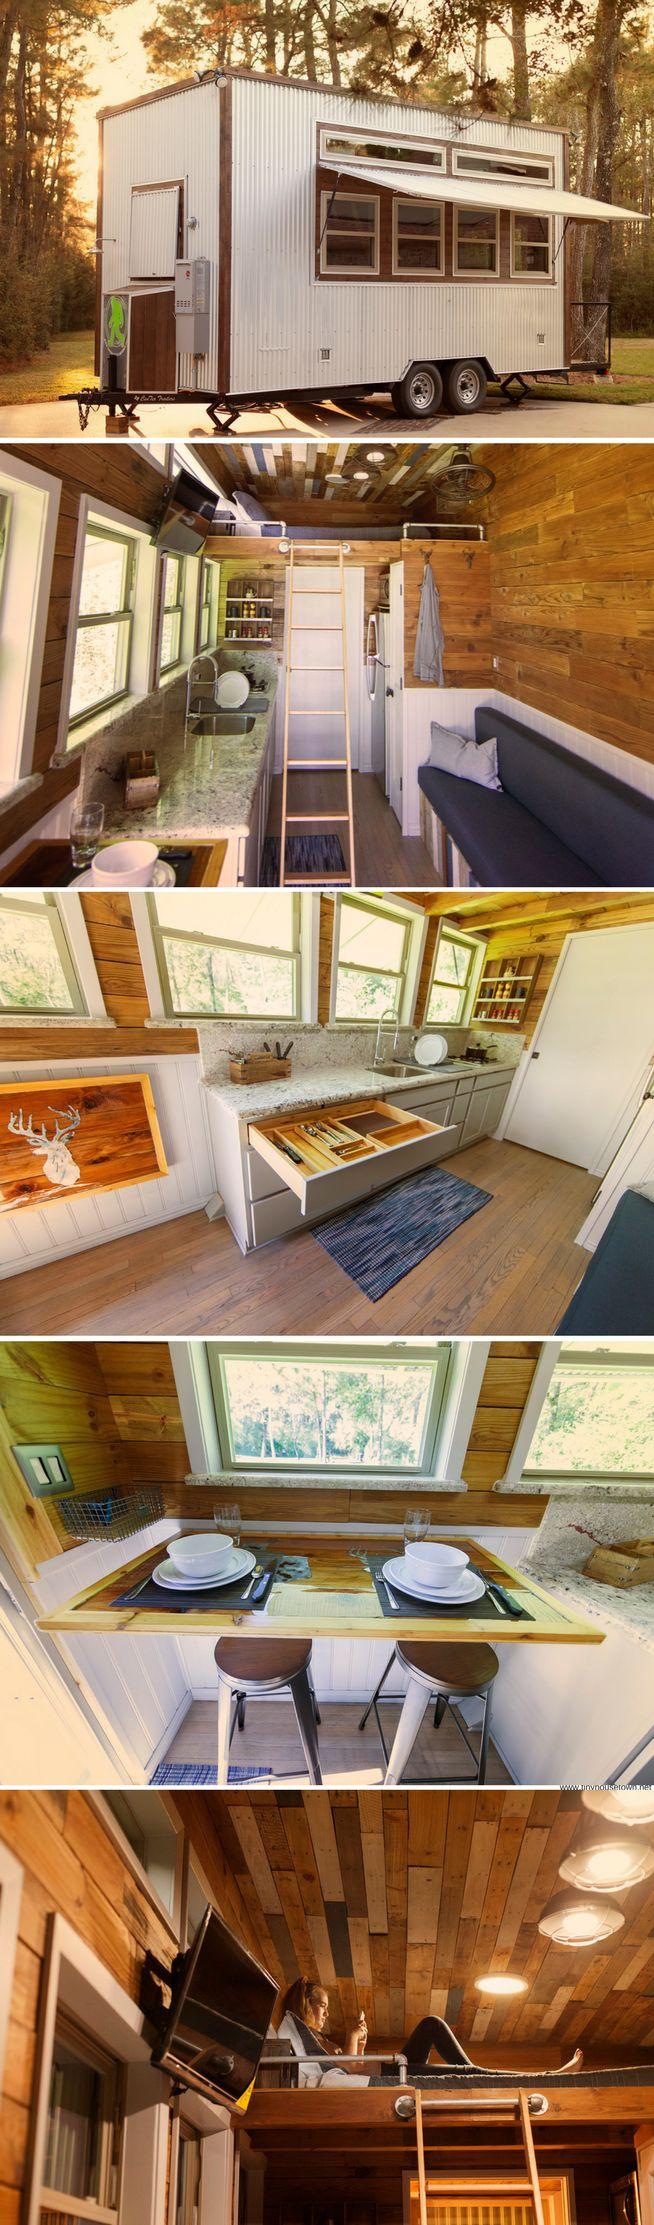 The Barton Ranch tiny home by Sasquatch Custom Homes